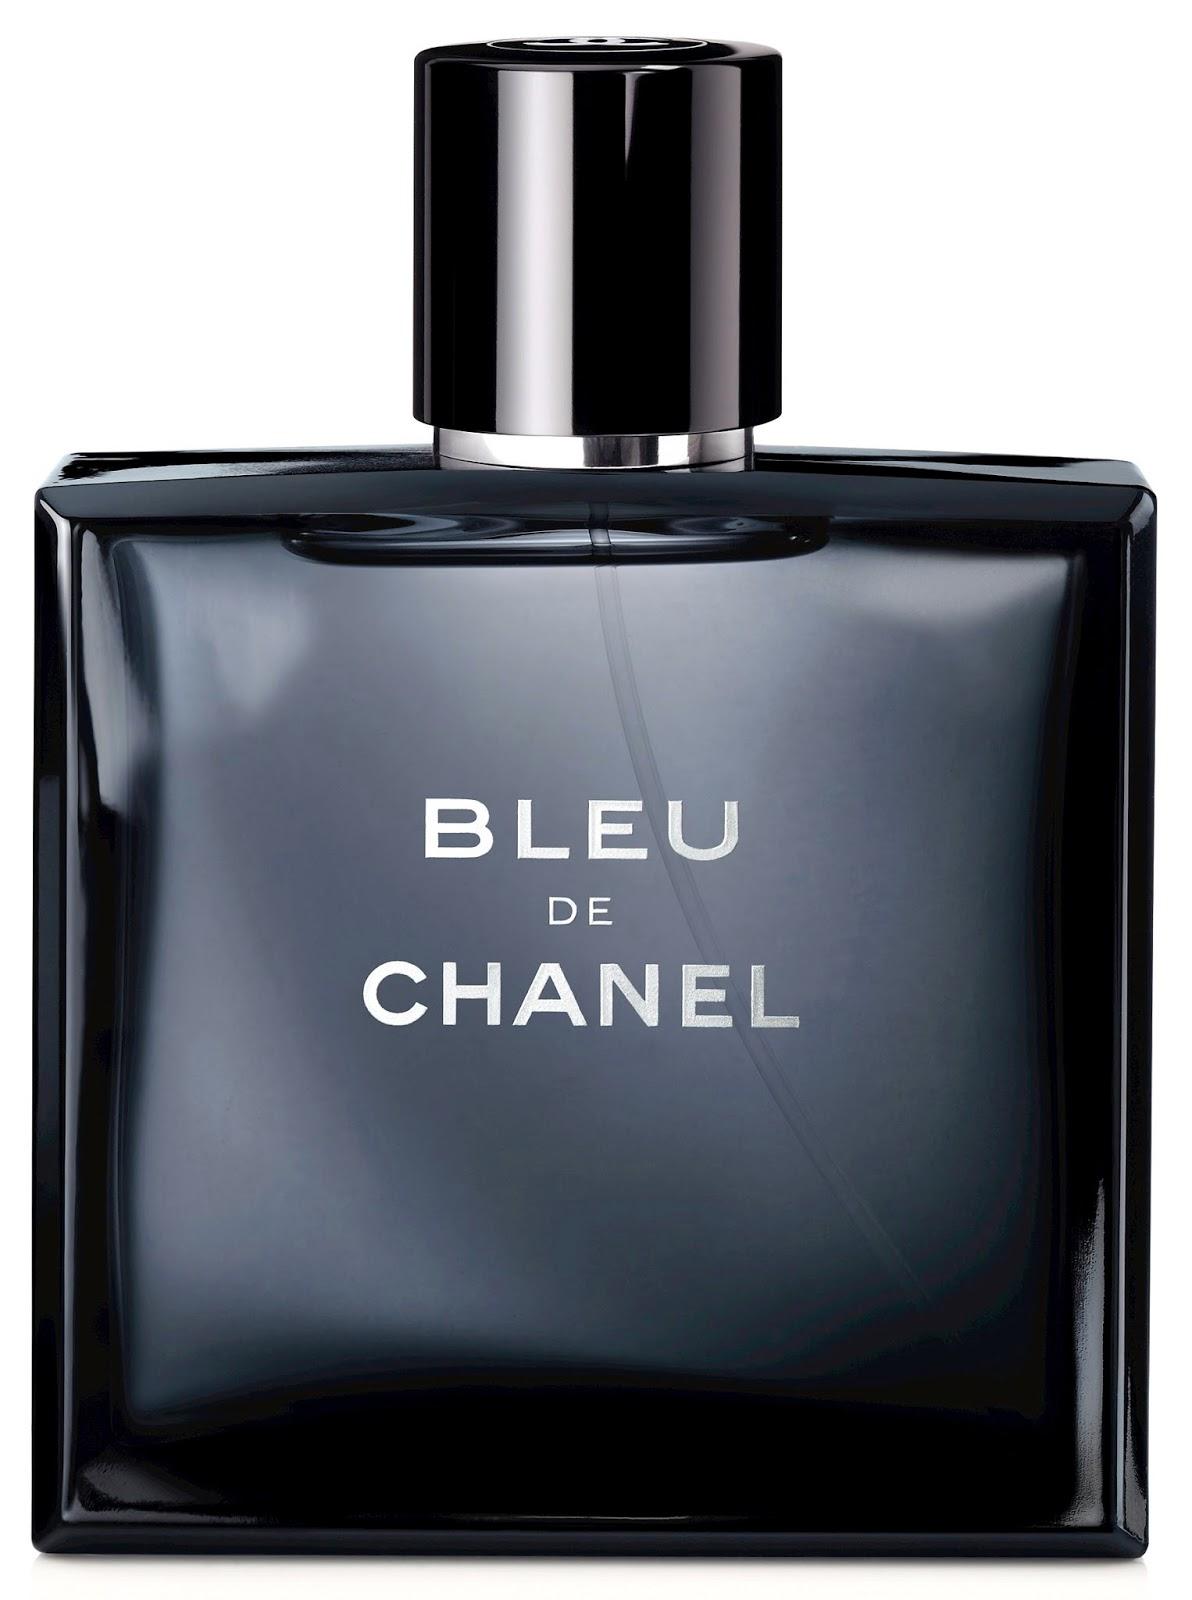 Perfume Importado Bleu de Chanel Edp 100ml - Chanel Masculino